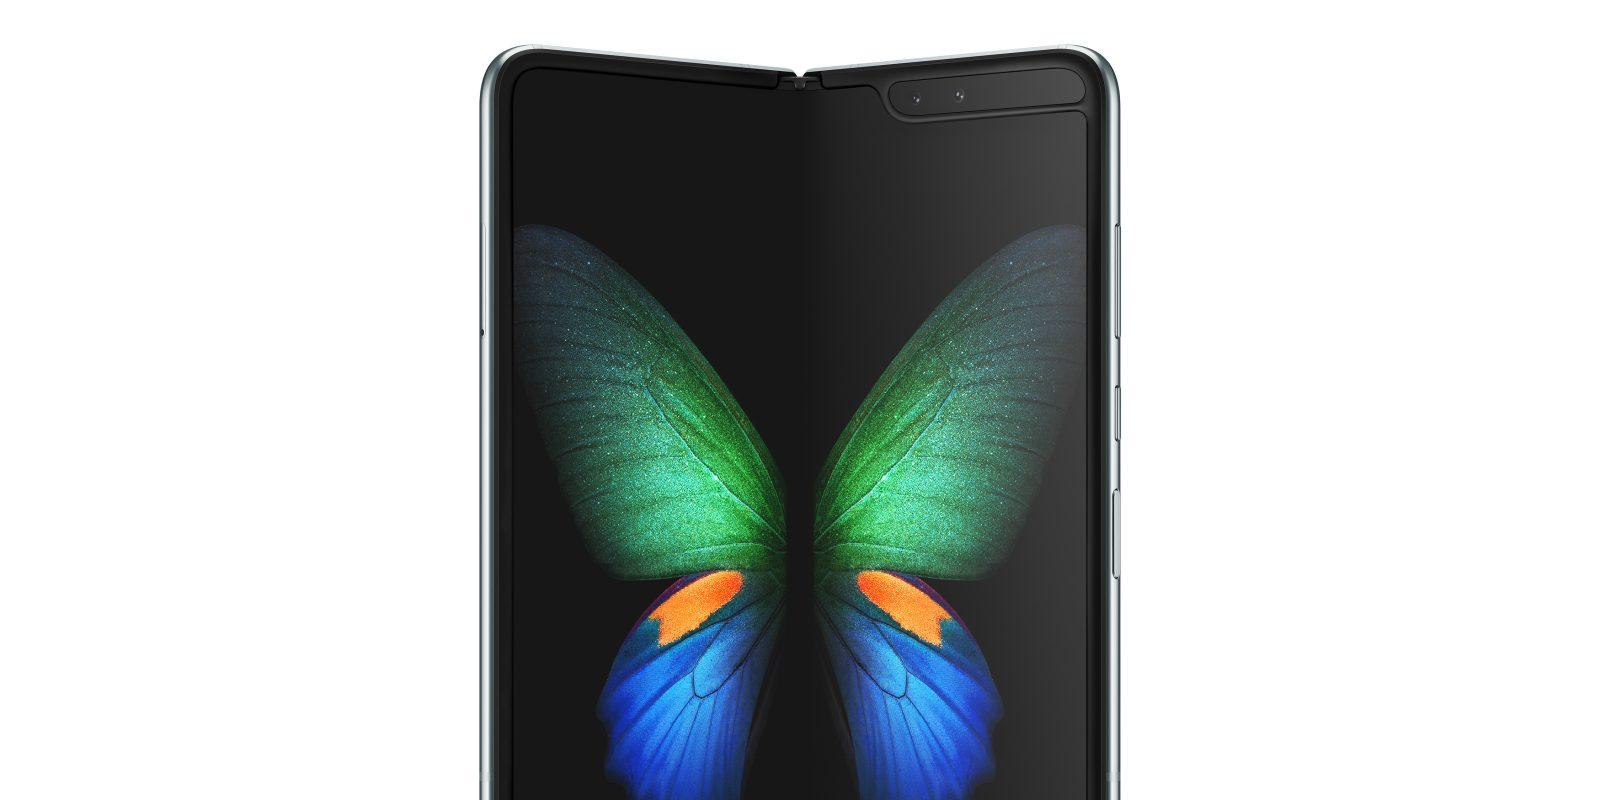 Samsung Galaxy Fold - 9to5Google